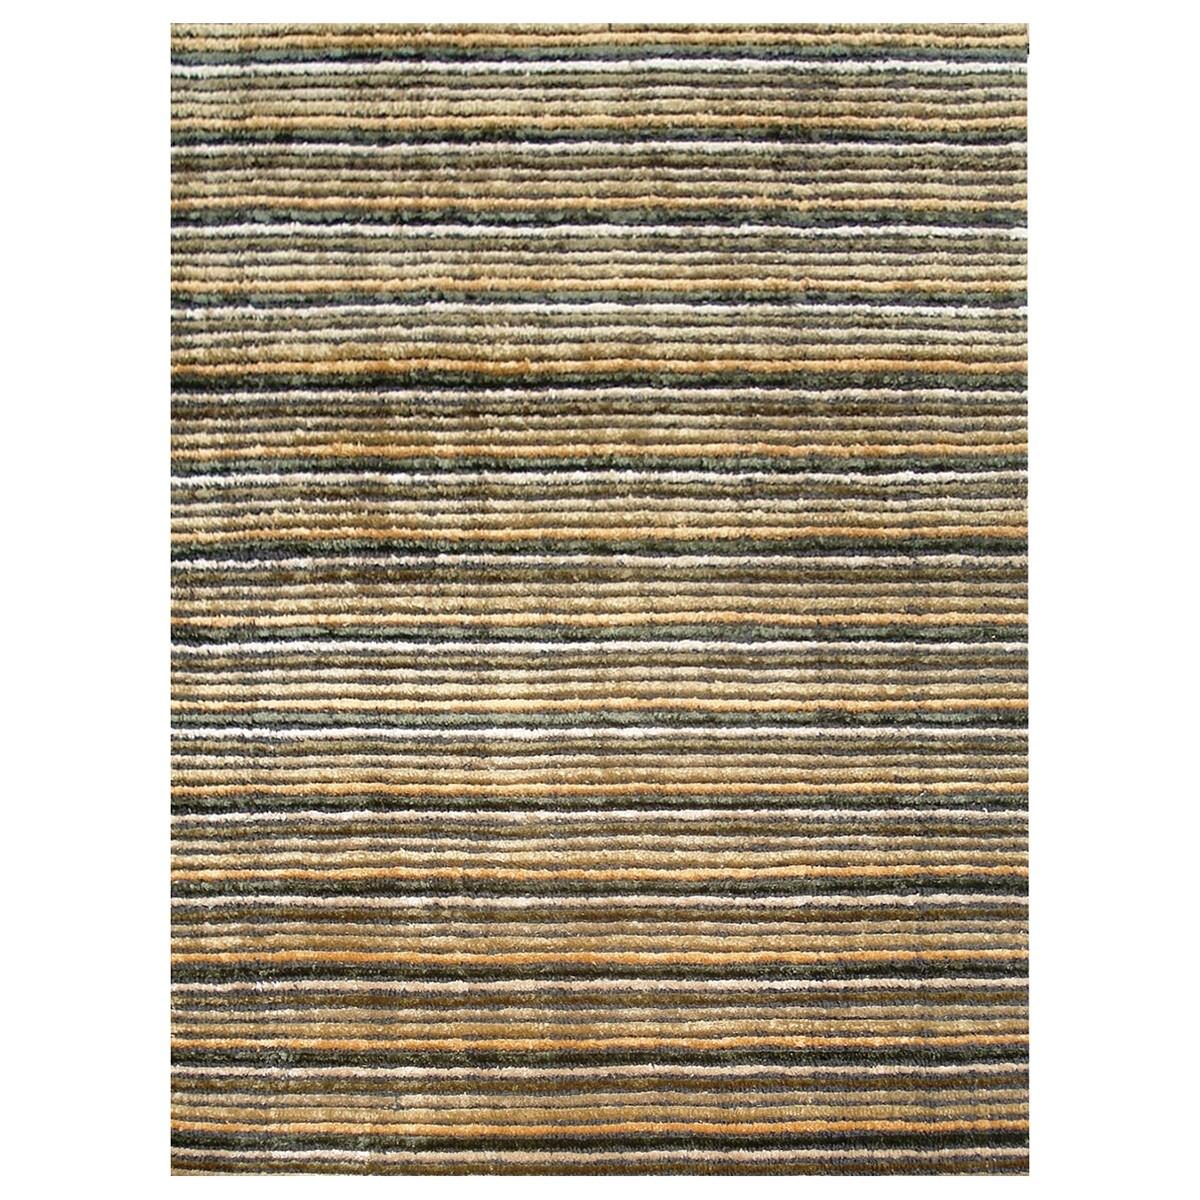 Alfonso Modern Wool & Viscose Rug, 230x160cm, Autumn Field